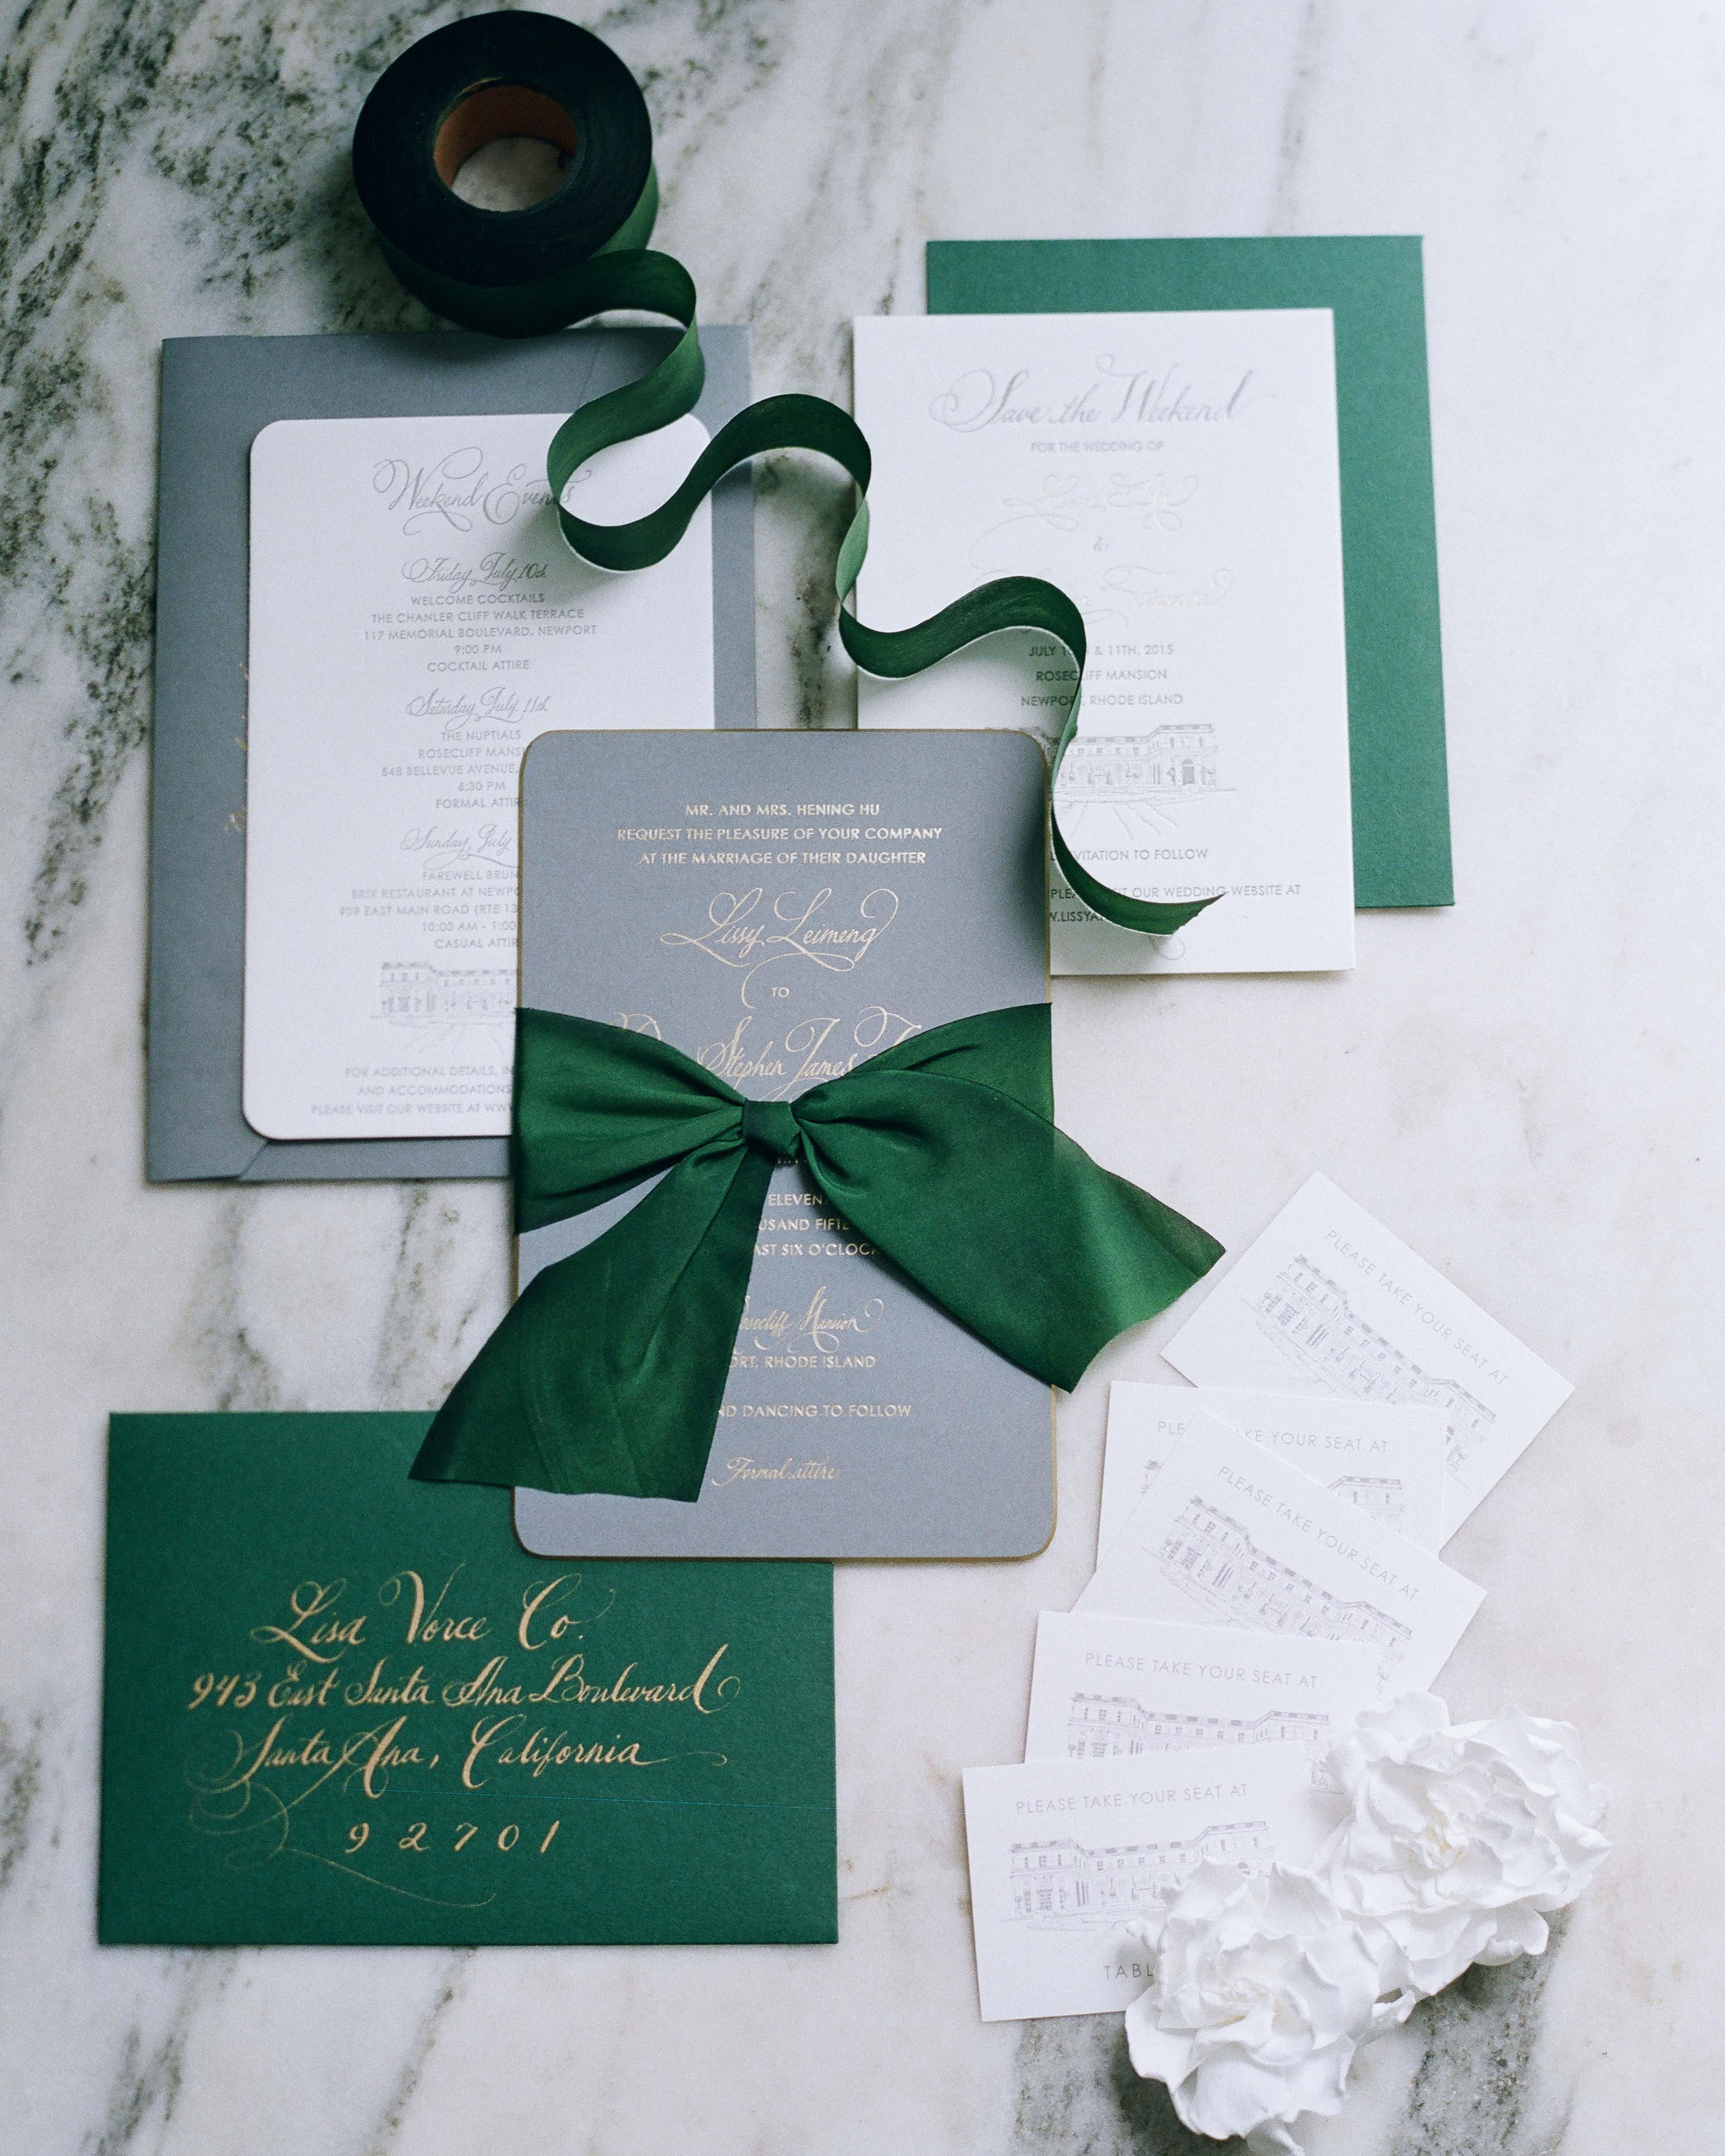 lissy-steven-wedding-newport-invitation-027-elizabethmessina-s112907-0516.jpg